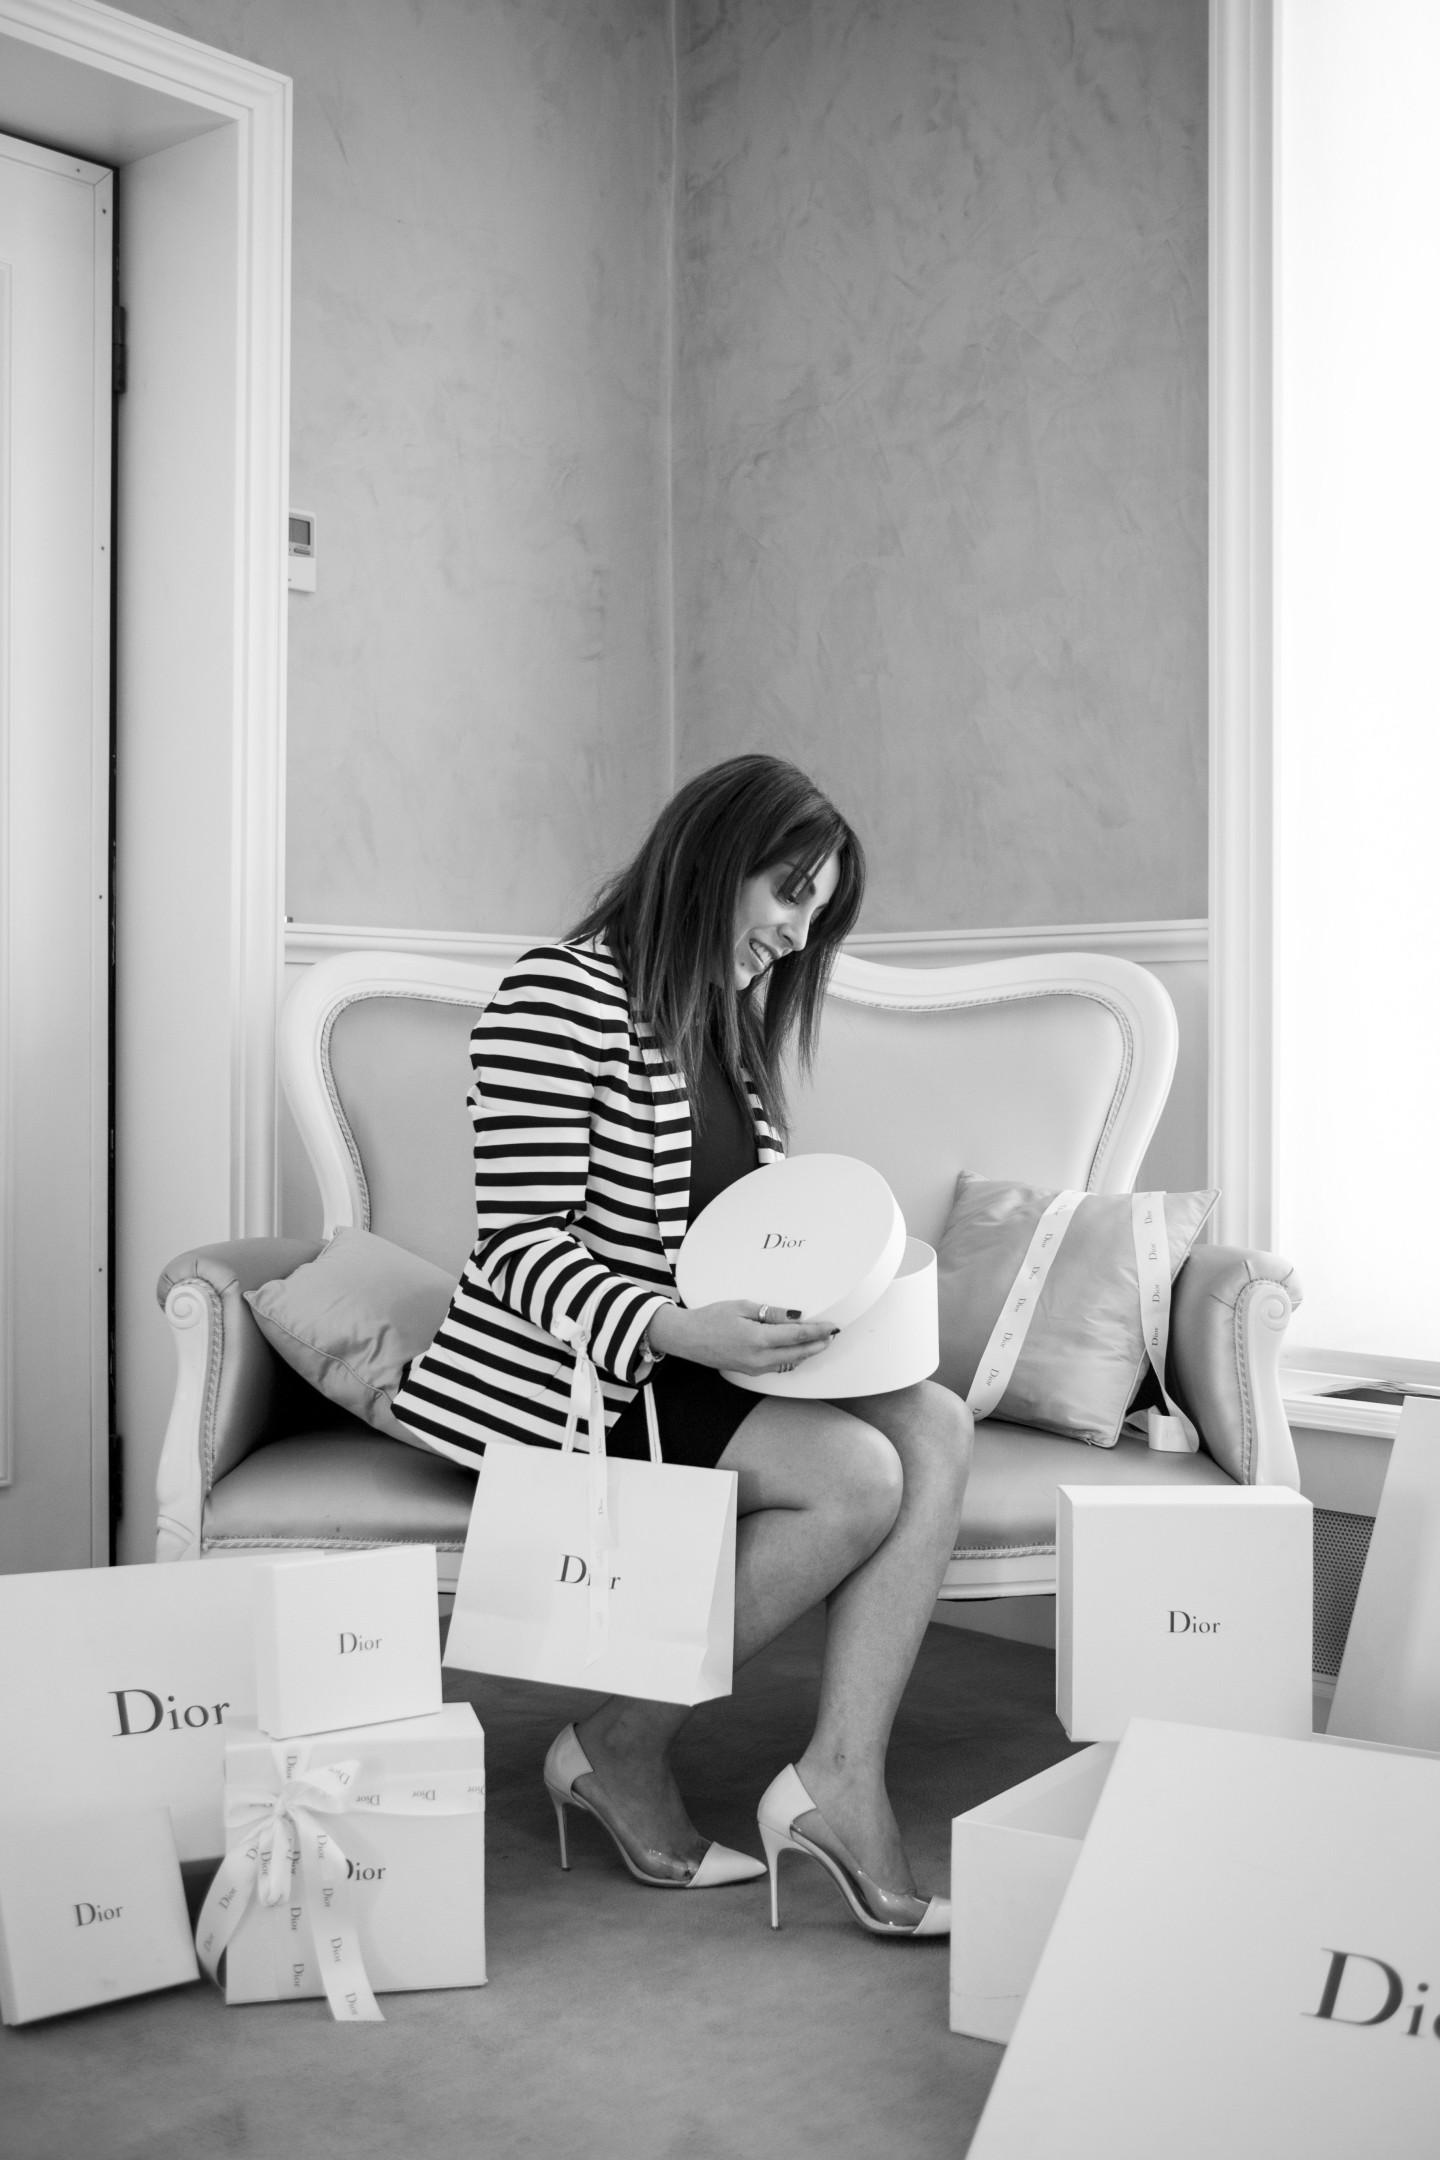 dior-nude-air-2015-valentina-coco-fashion-blogger-make-up-paris